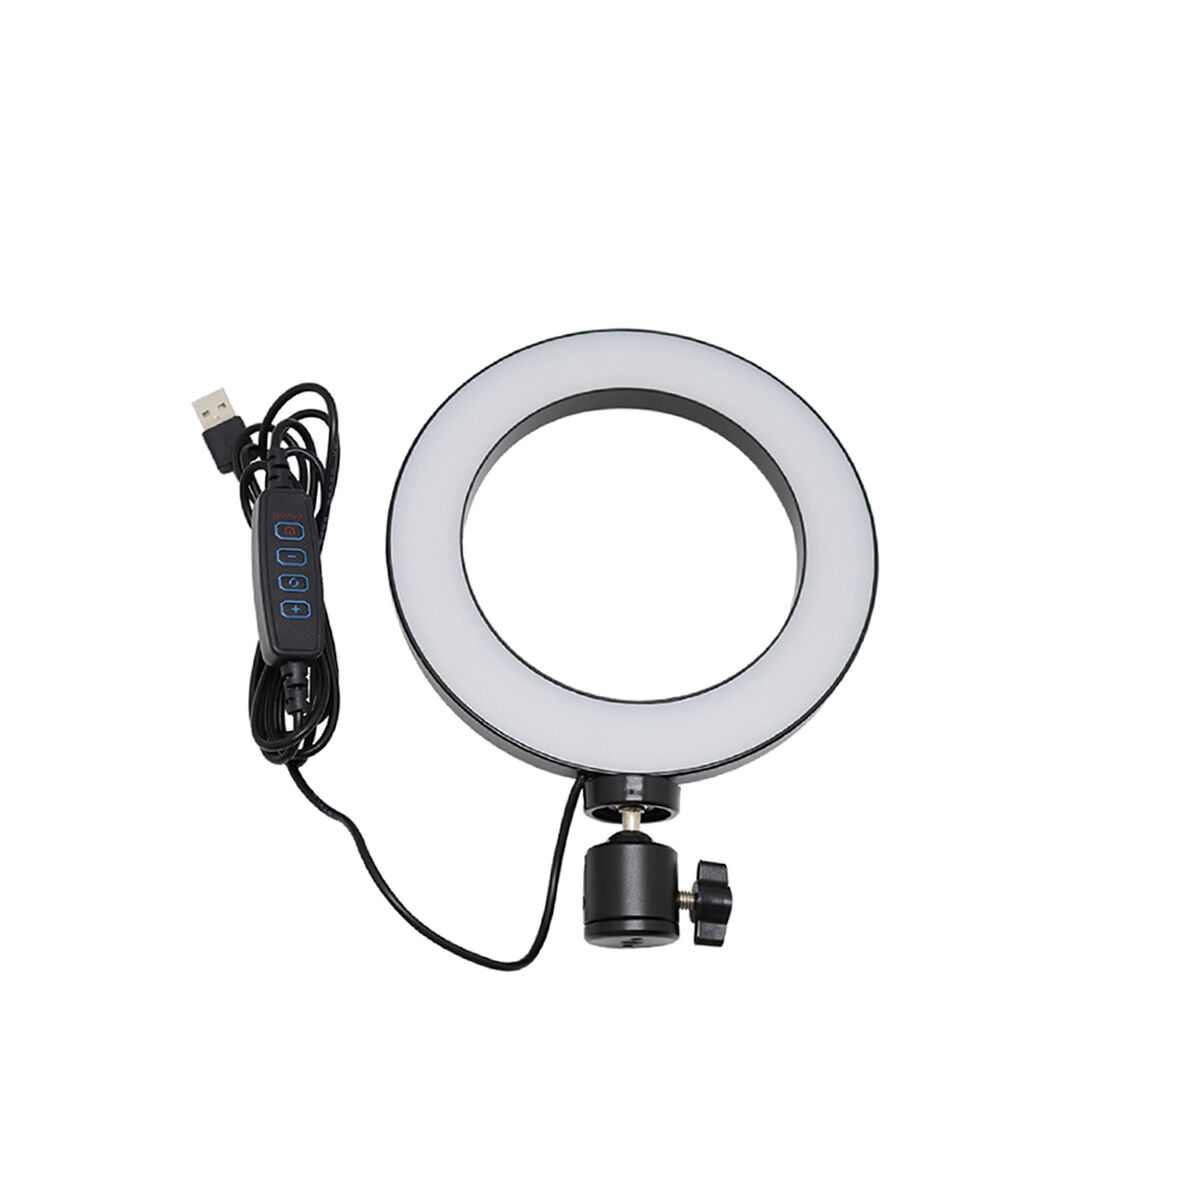 "Kit Selfie Njoytech NJK-TRP10P Trípode + Aro LED 10"" + Soportes Celular"